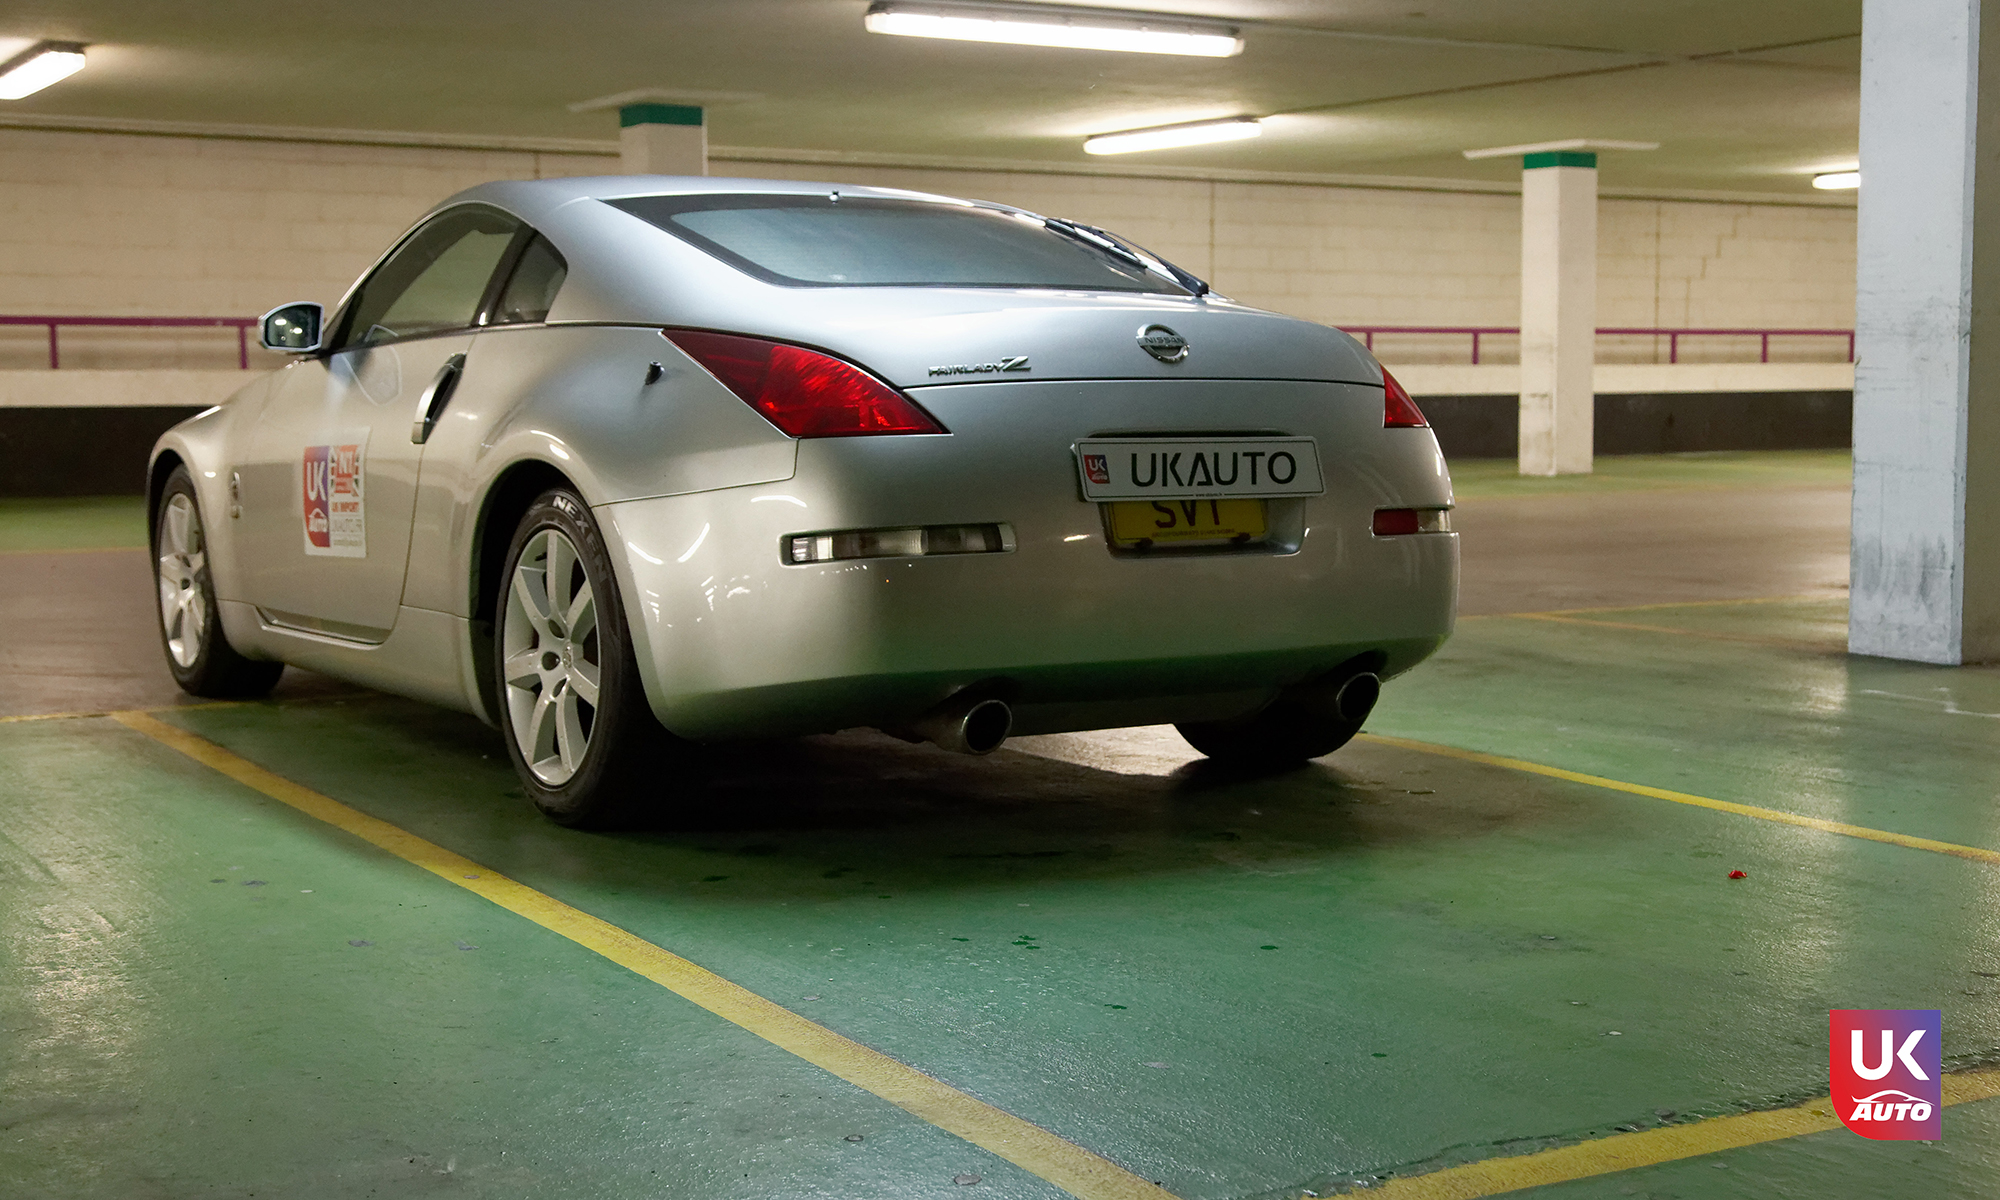 Ukauto import nissan 350z jdm import fairlady v6 import uk ukauto rhd nissan import uk4 - Import Nissan 350Z JDM IMPORT 3.5 V6 TIPTRONIC IMPORT AUTO par UKAUTO